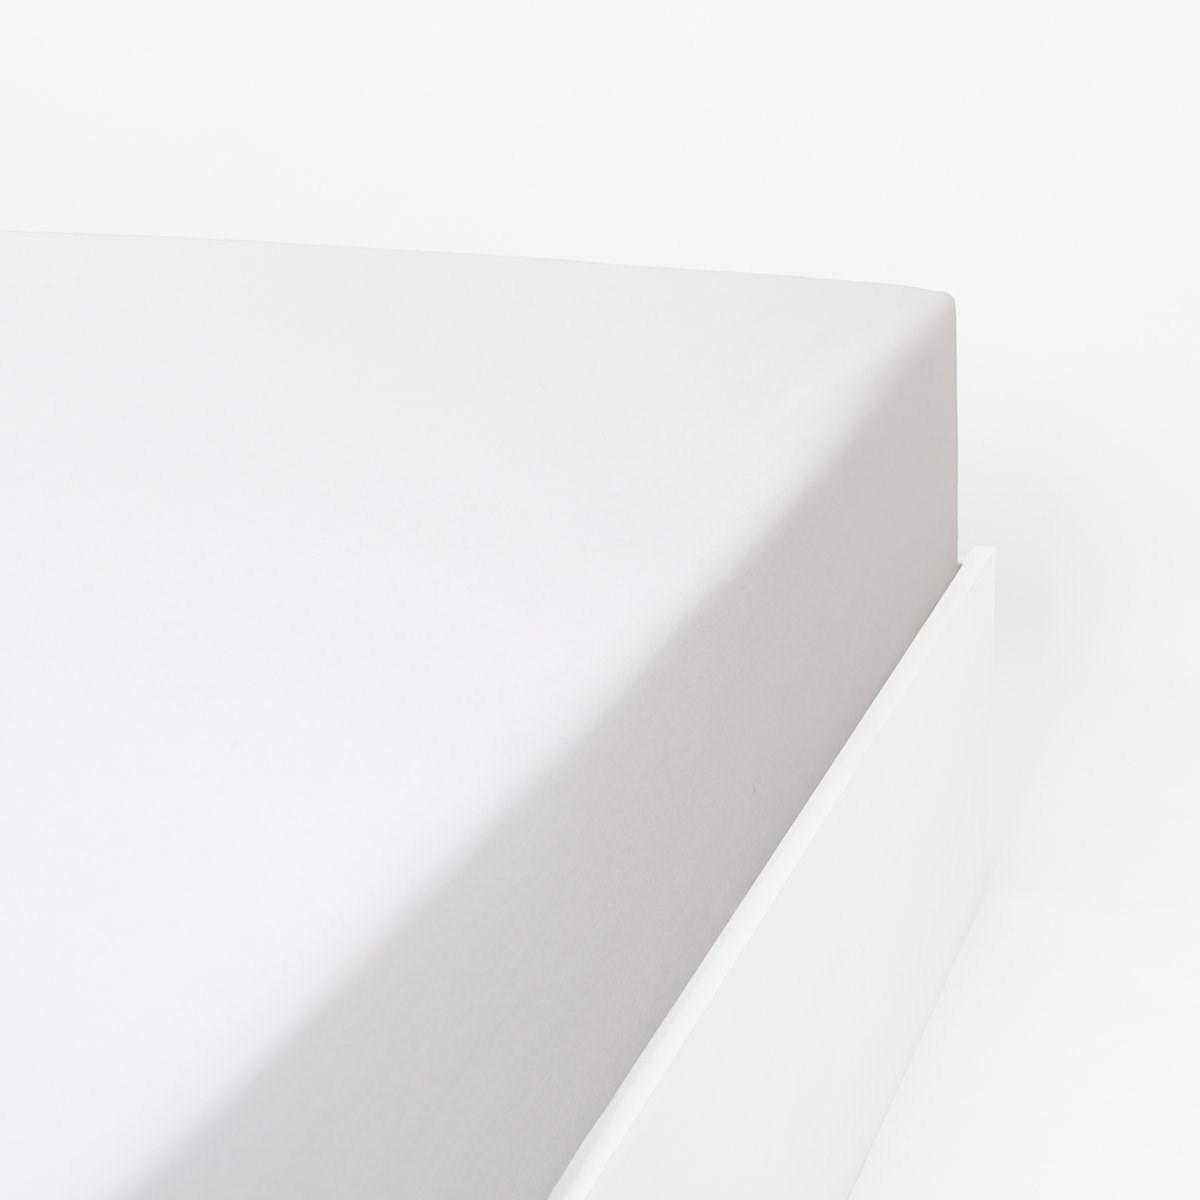 Drap housse flanelle en Molleton Blanc 80x200 cm